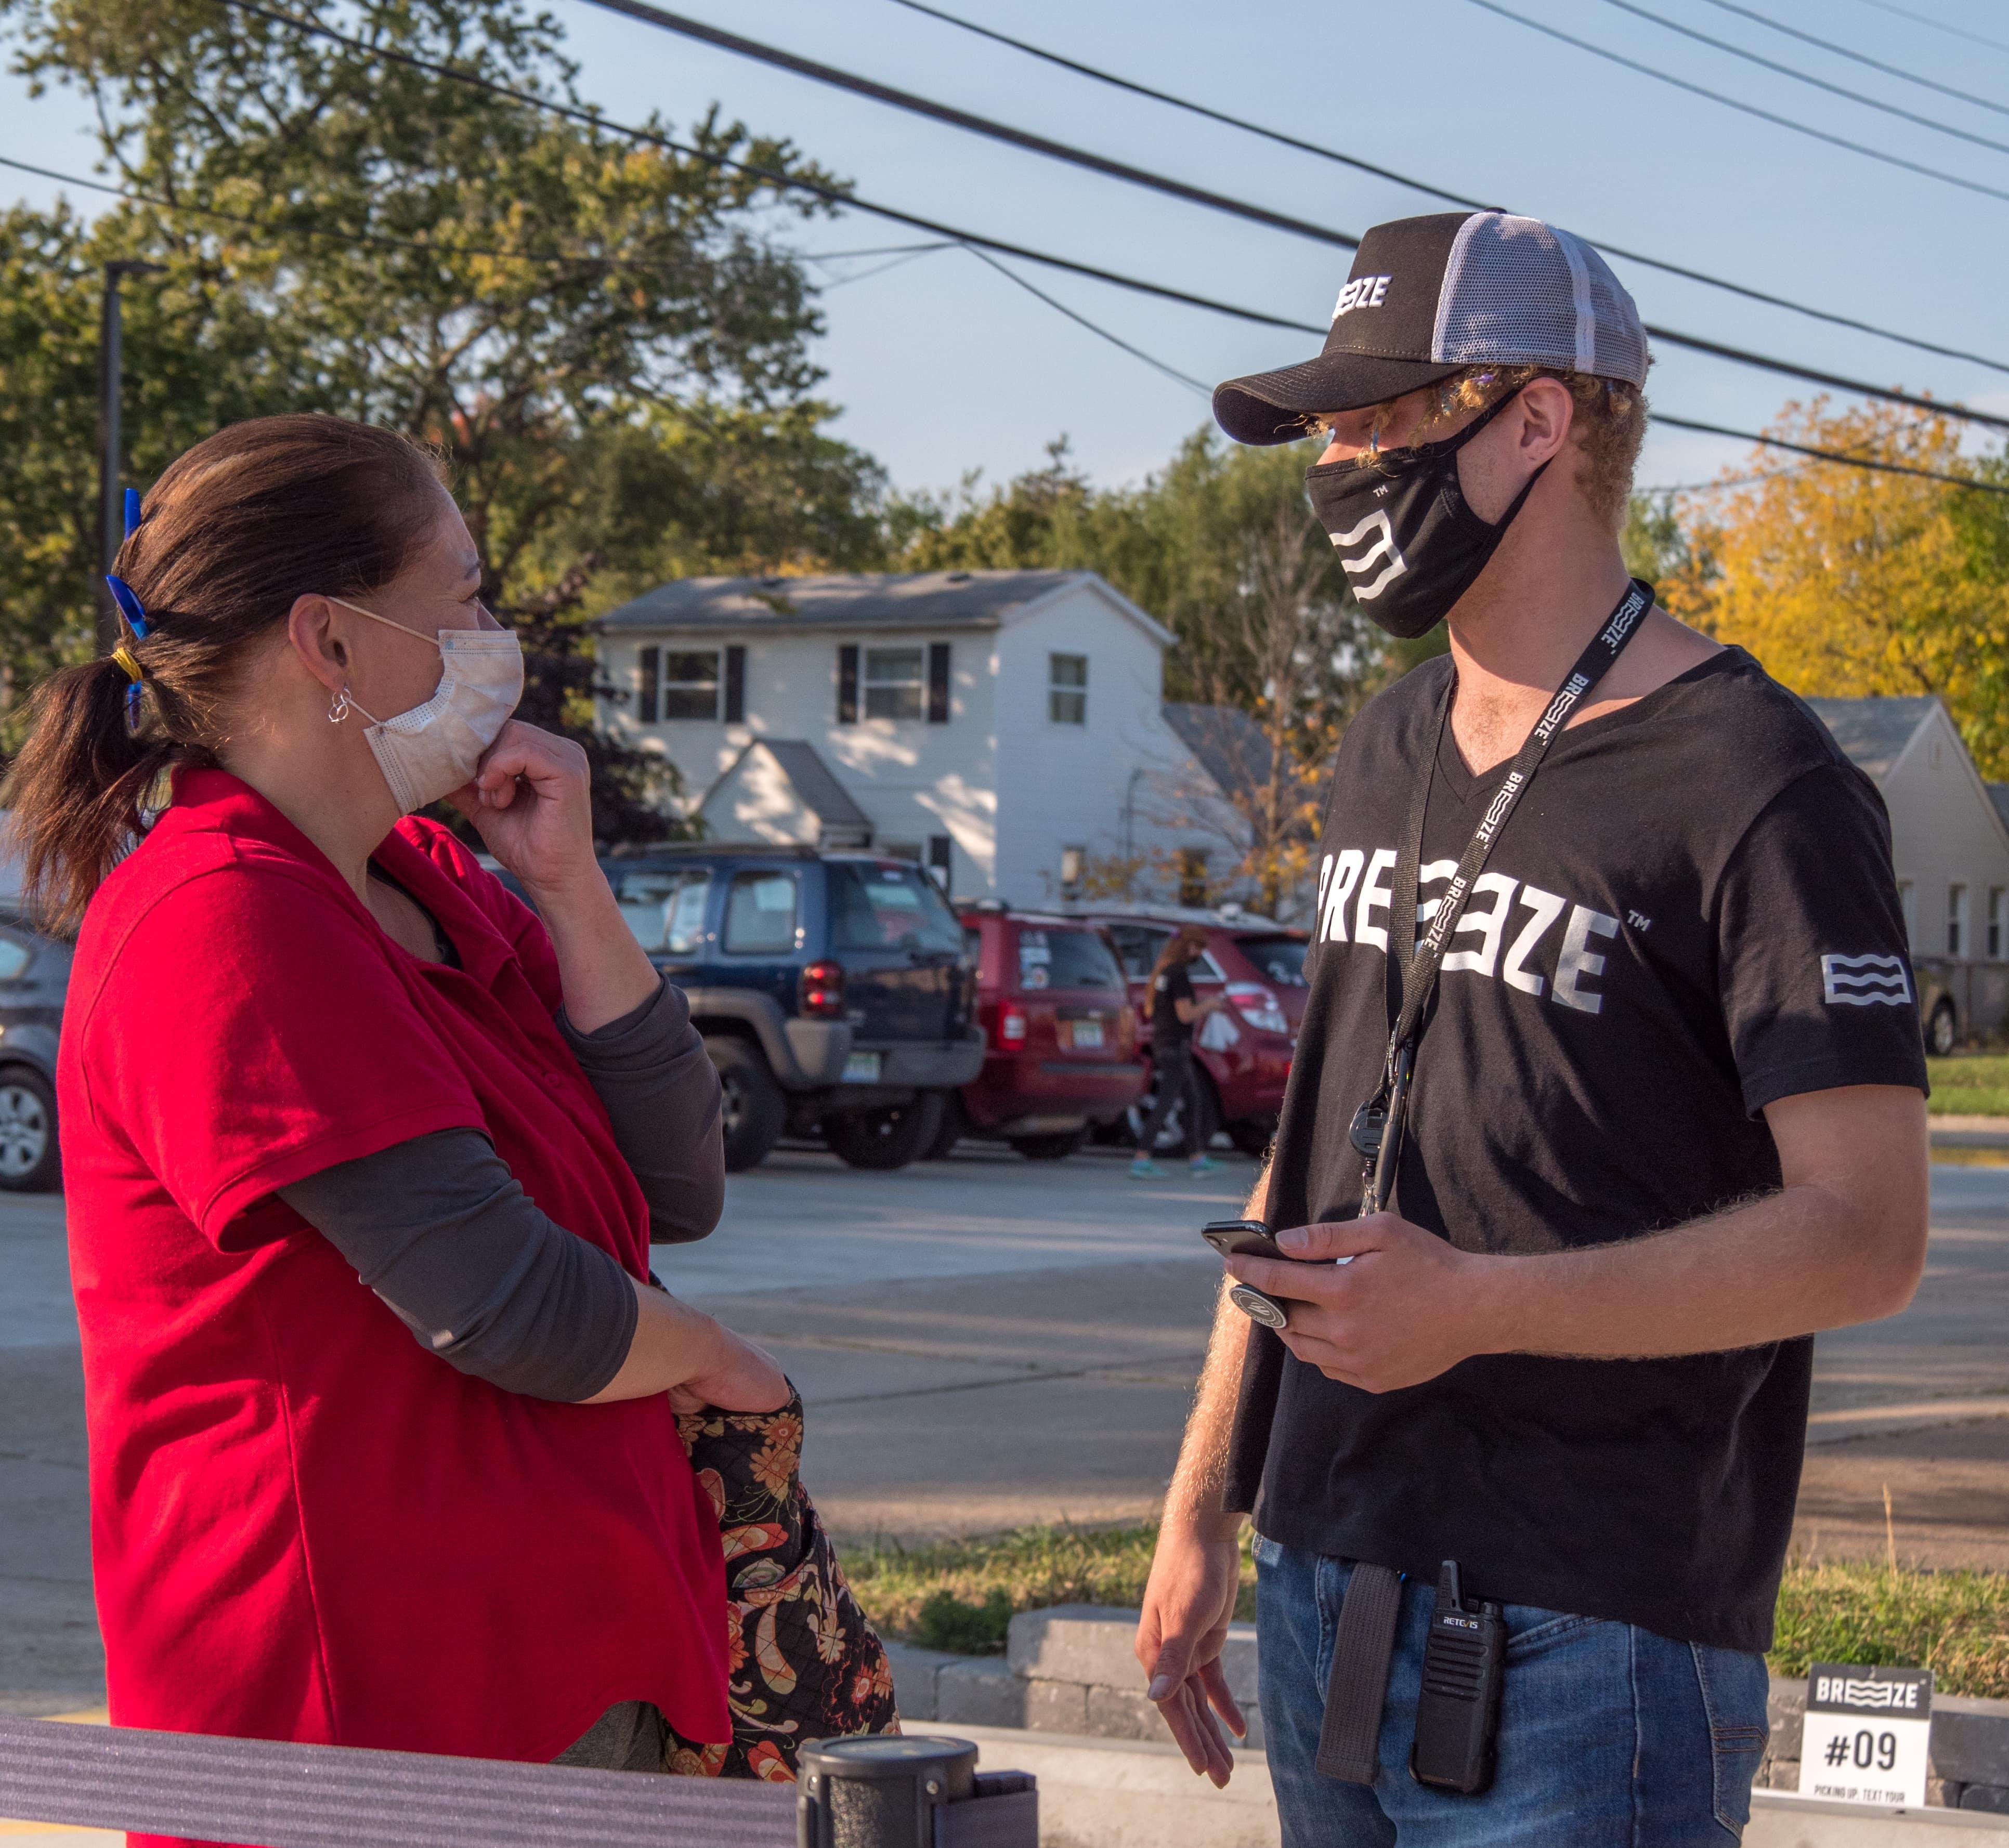 Breeze employee talking with customer